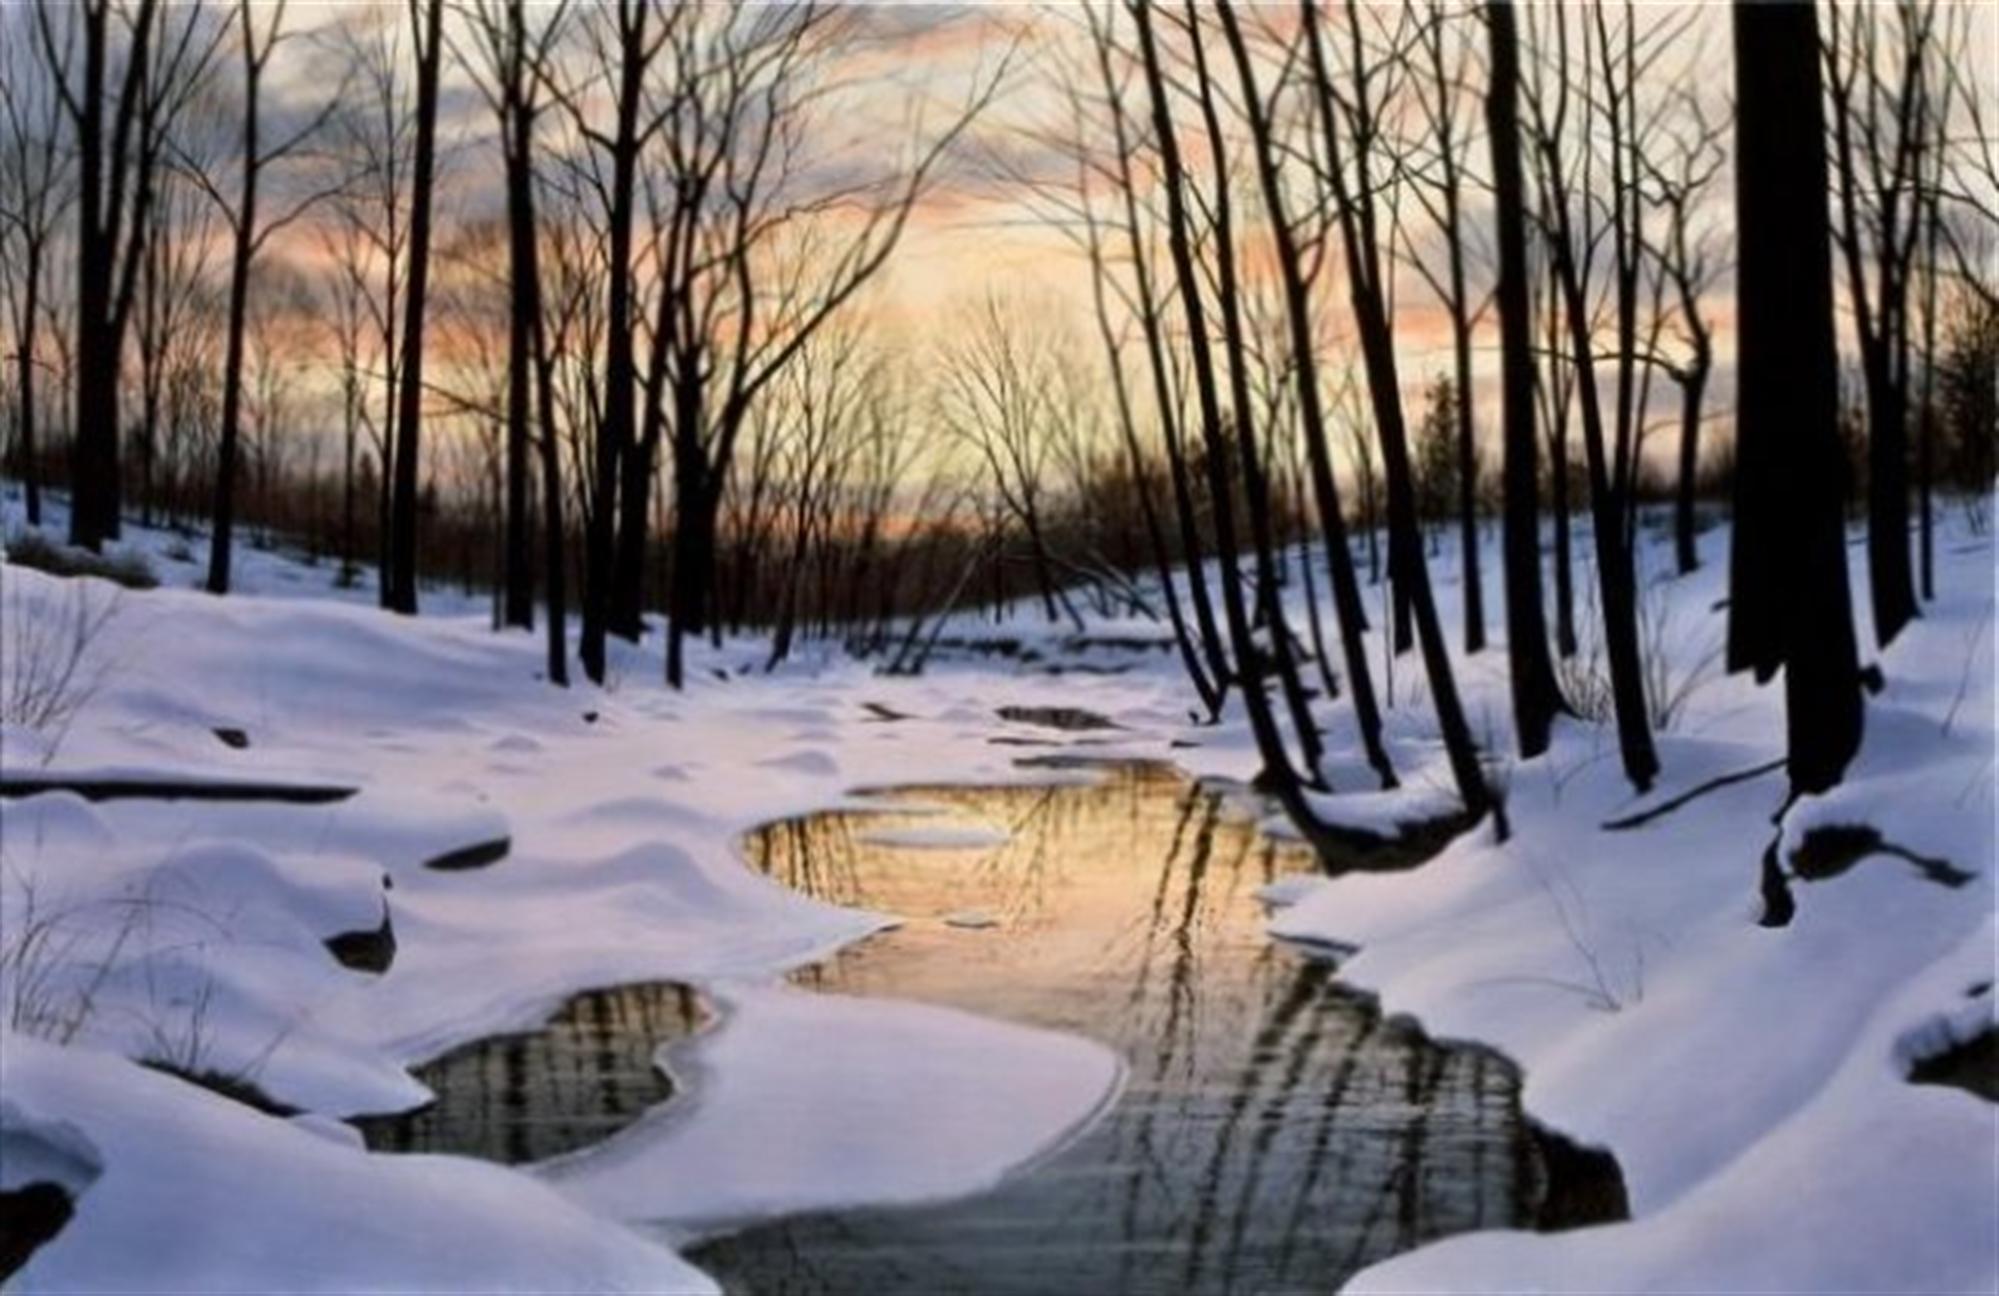 Nightfall by Alexander Volkov